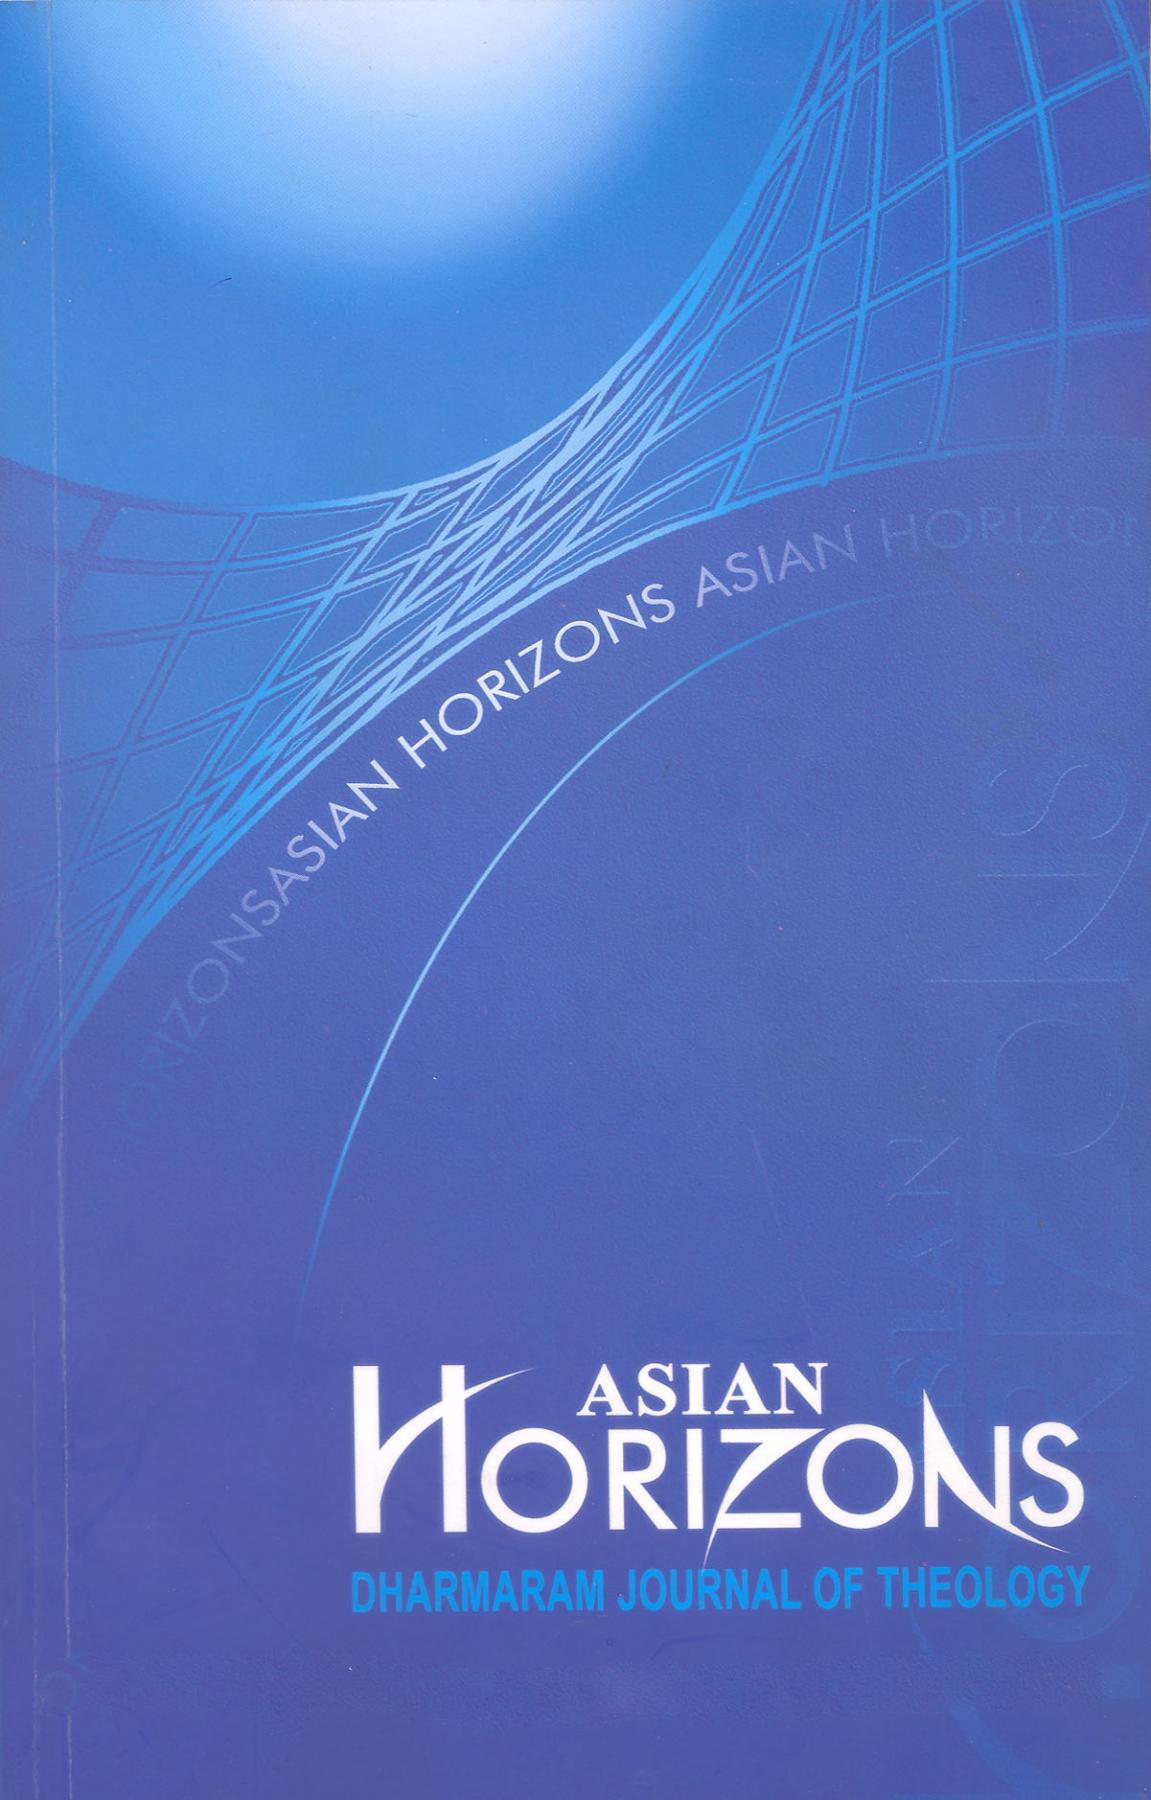 Asian Horizons